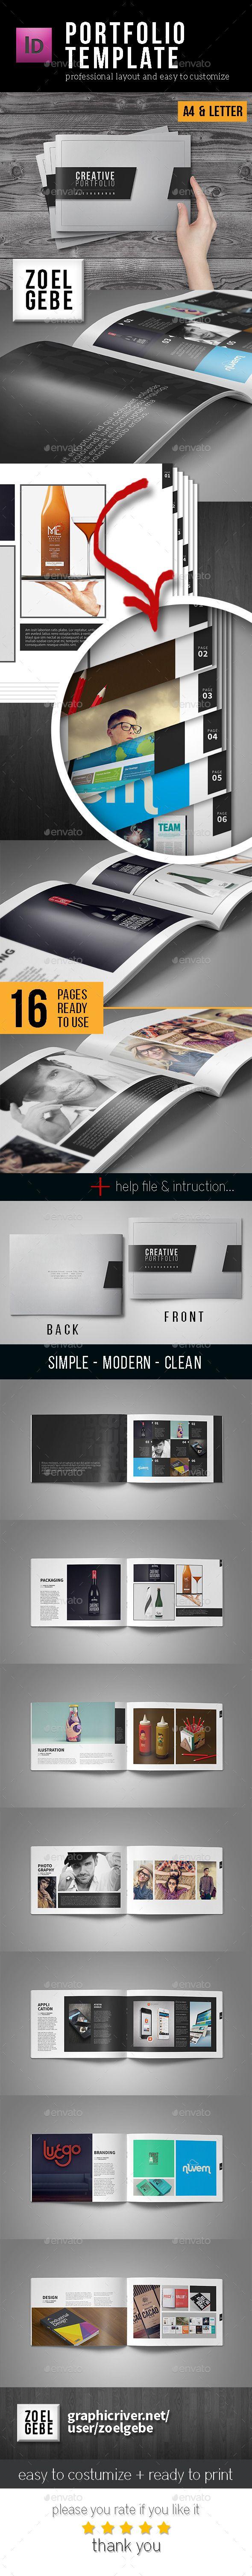 Portfolio Indesign Brochure Template #design Download: http://graphicriver.net/item/portfolio-template/12759896?ref=ksioks